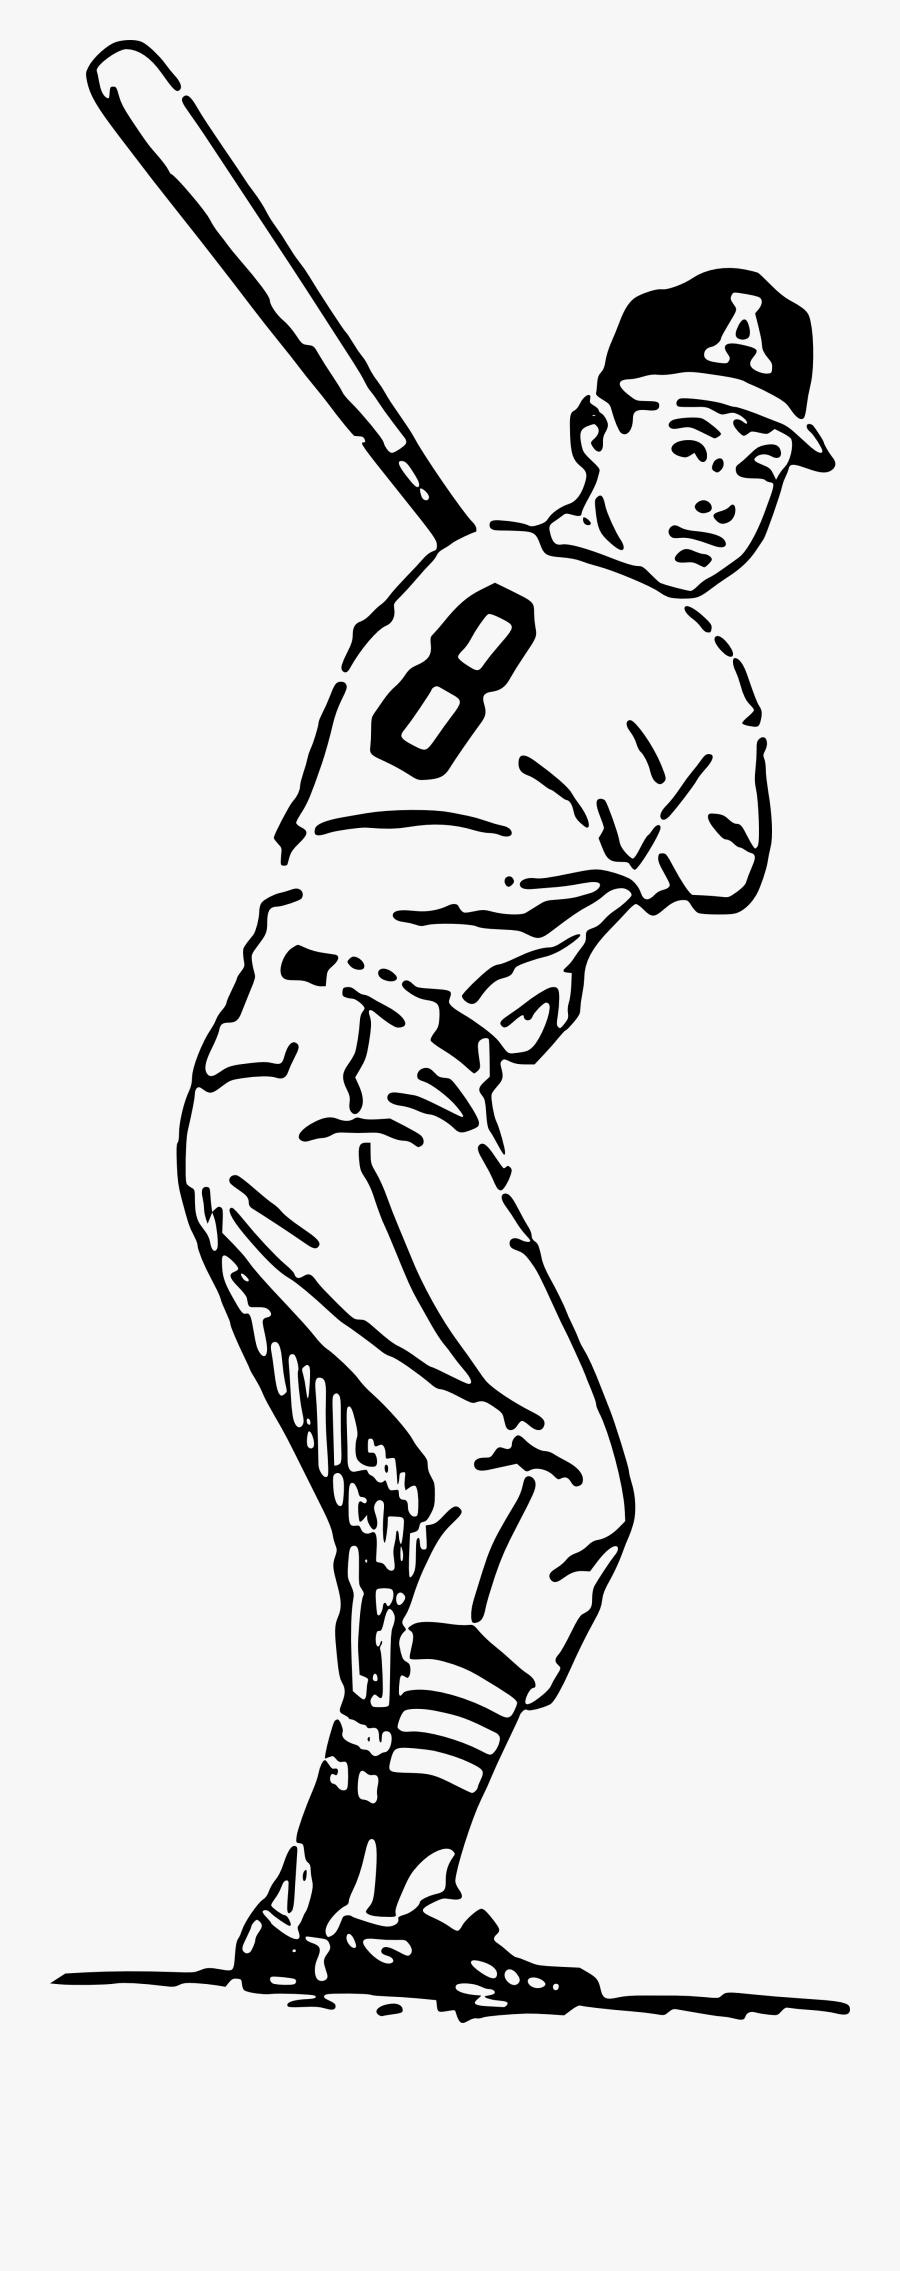 Vintage Sport - Baseball Player Cartoon Drawing, Transparent Clipart